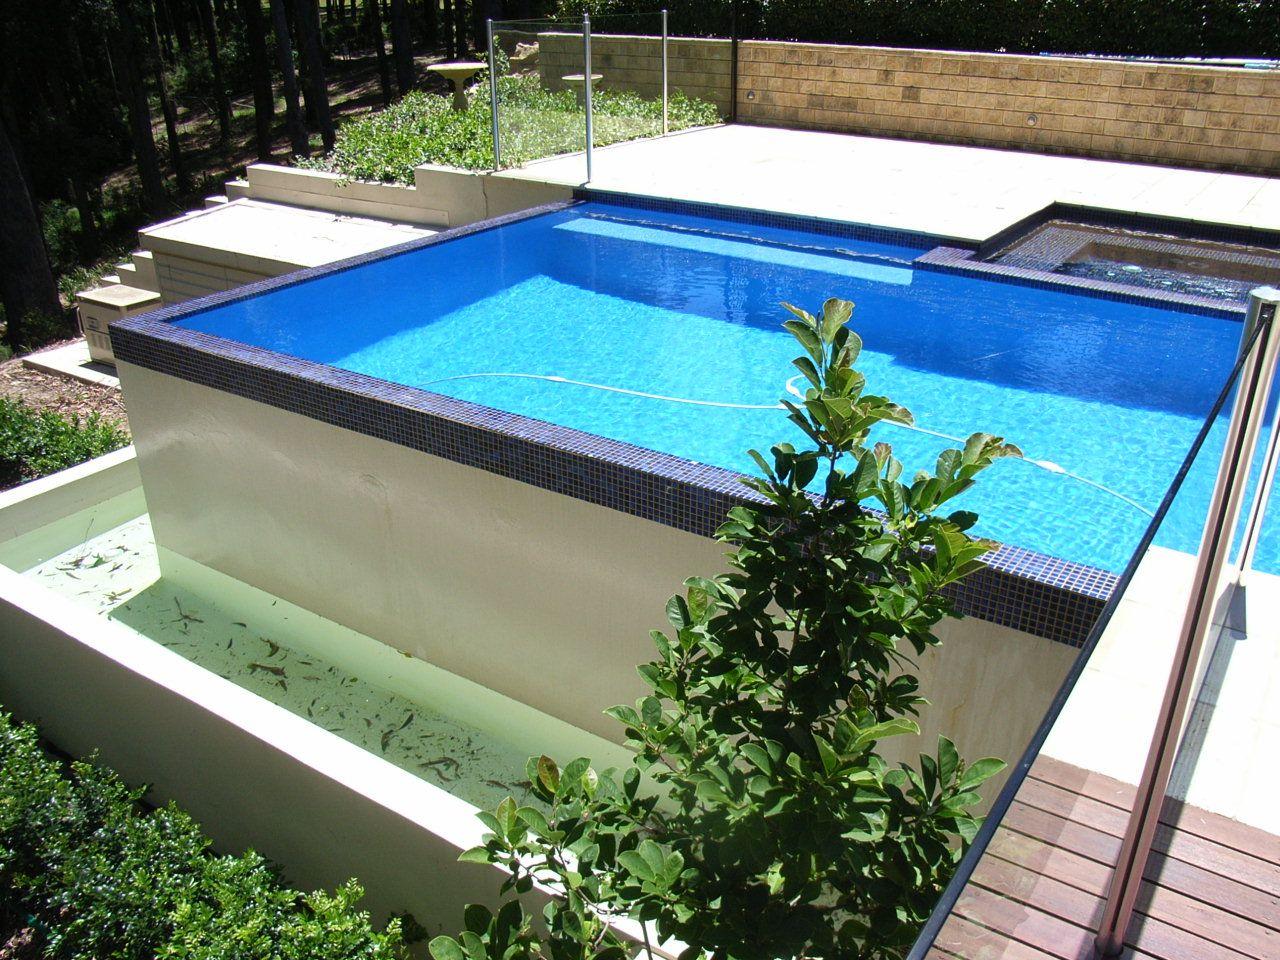 Negative edge pool with overflow tank | Pool l design | Pinterest